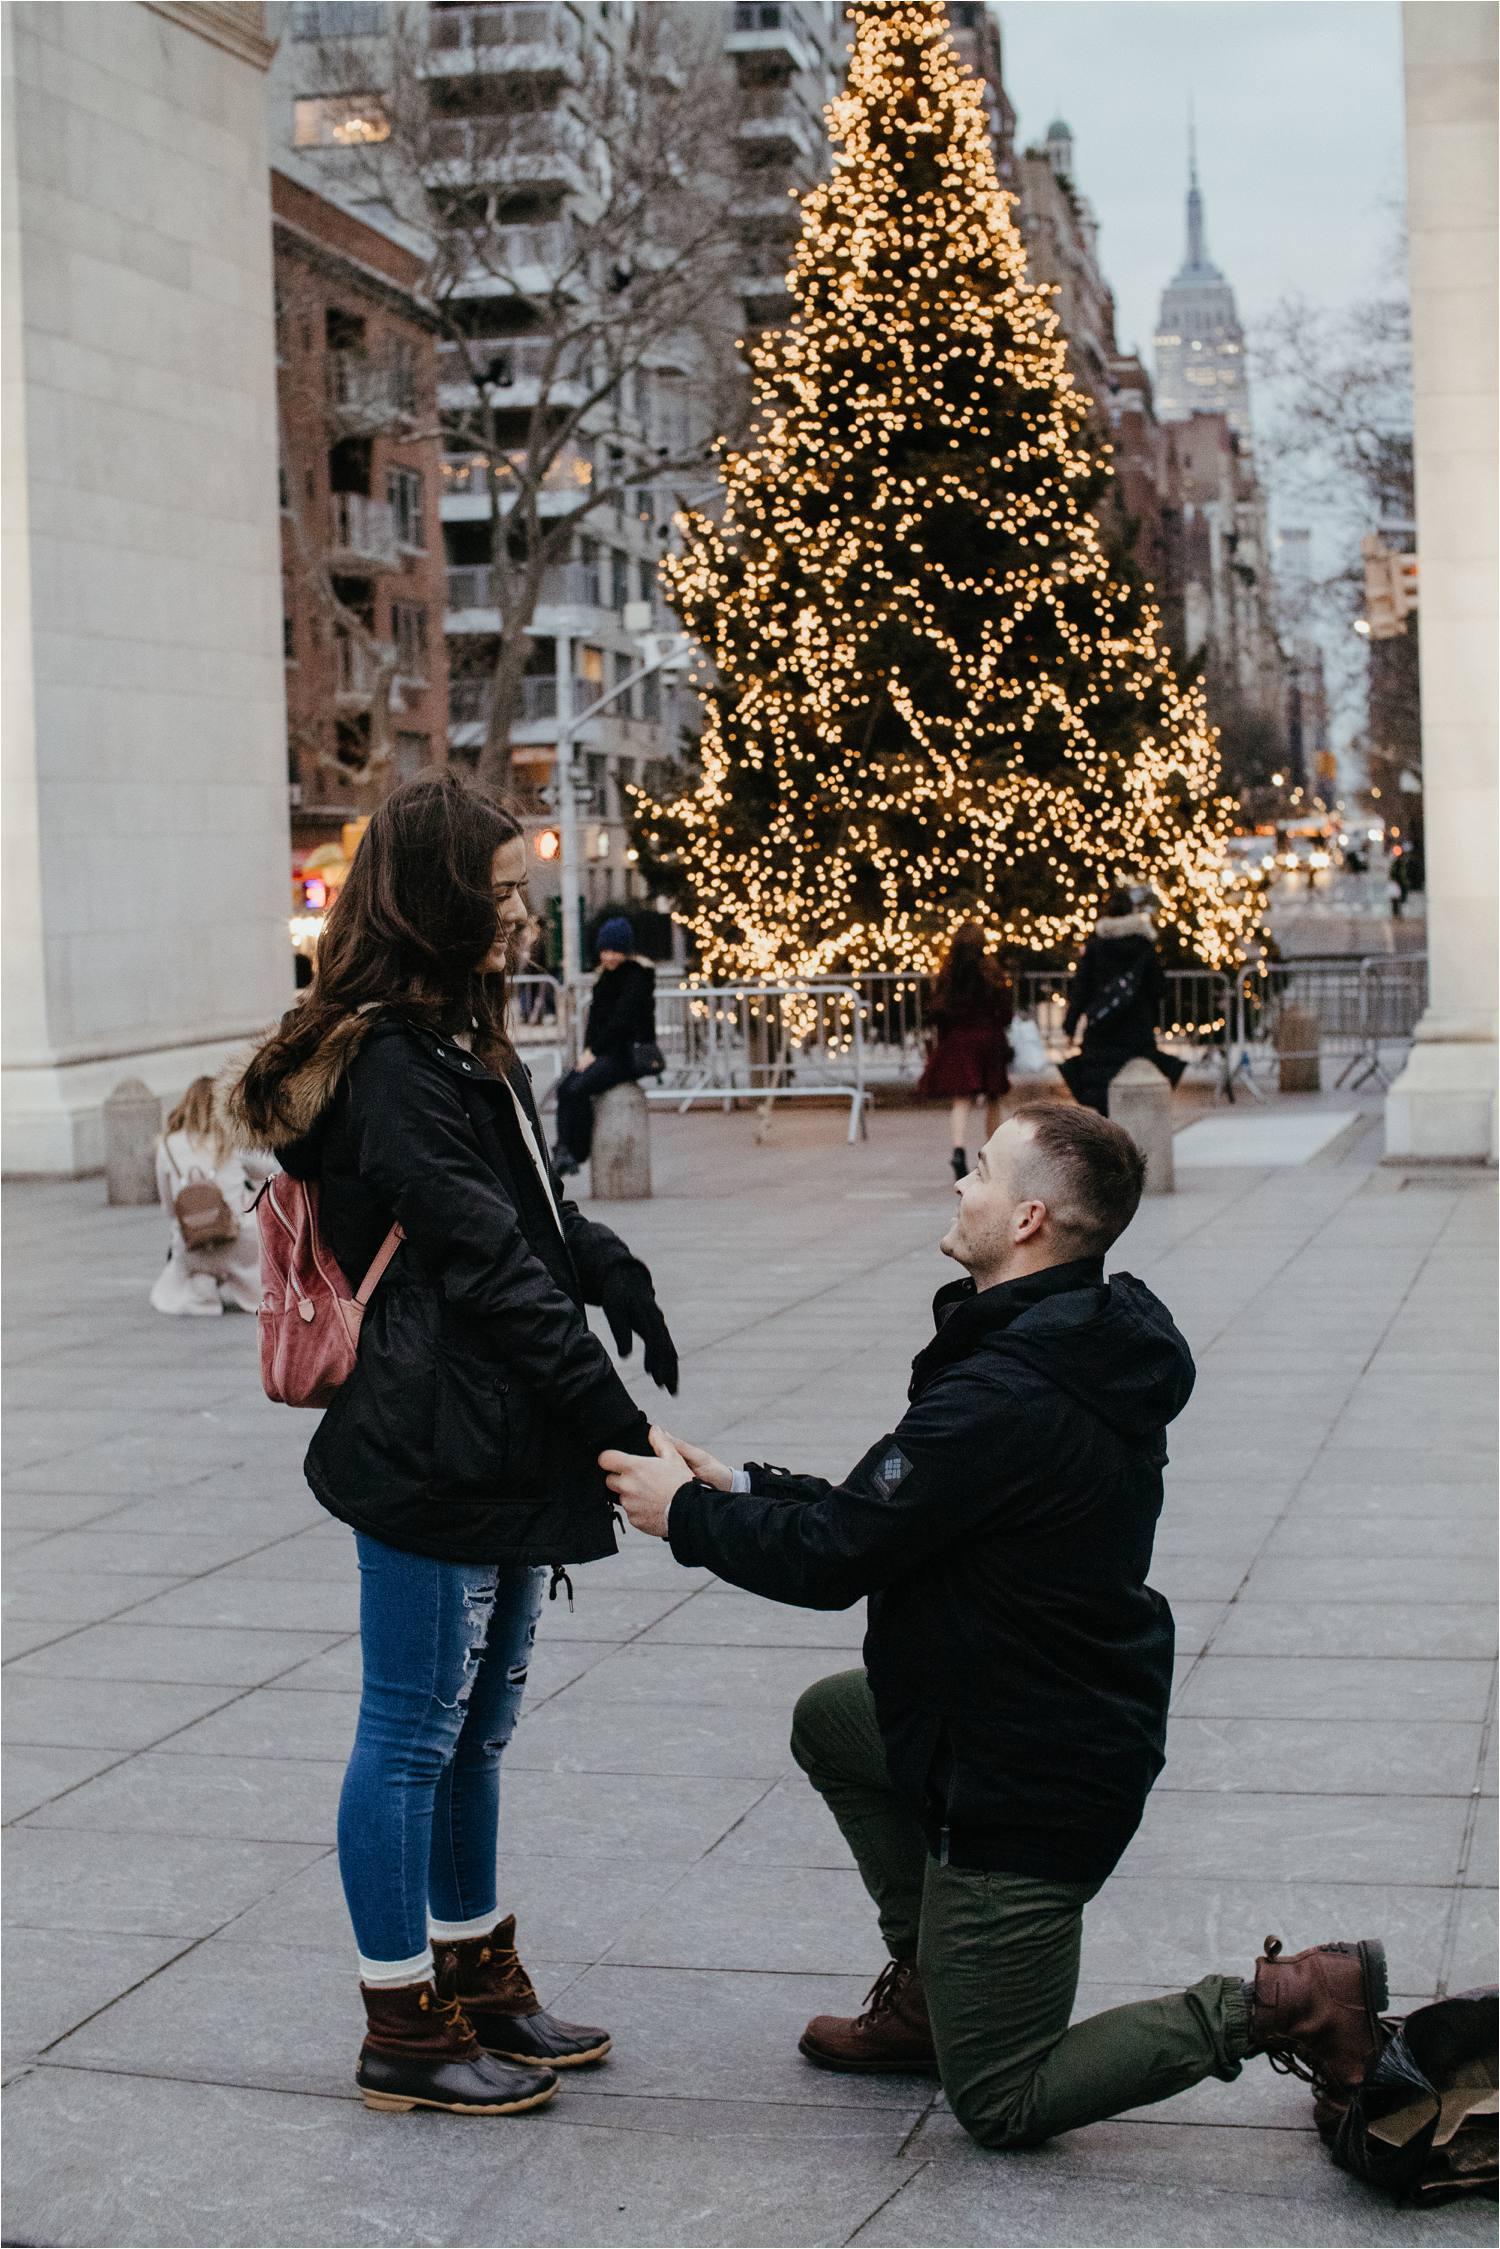 nyc proposal - washington square park engagement - washington square park proposal - nyc engagement photos - winter engagement photos nyc